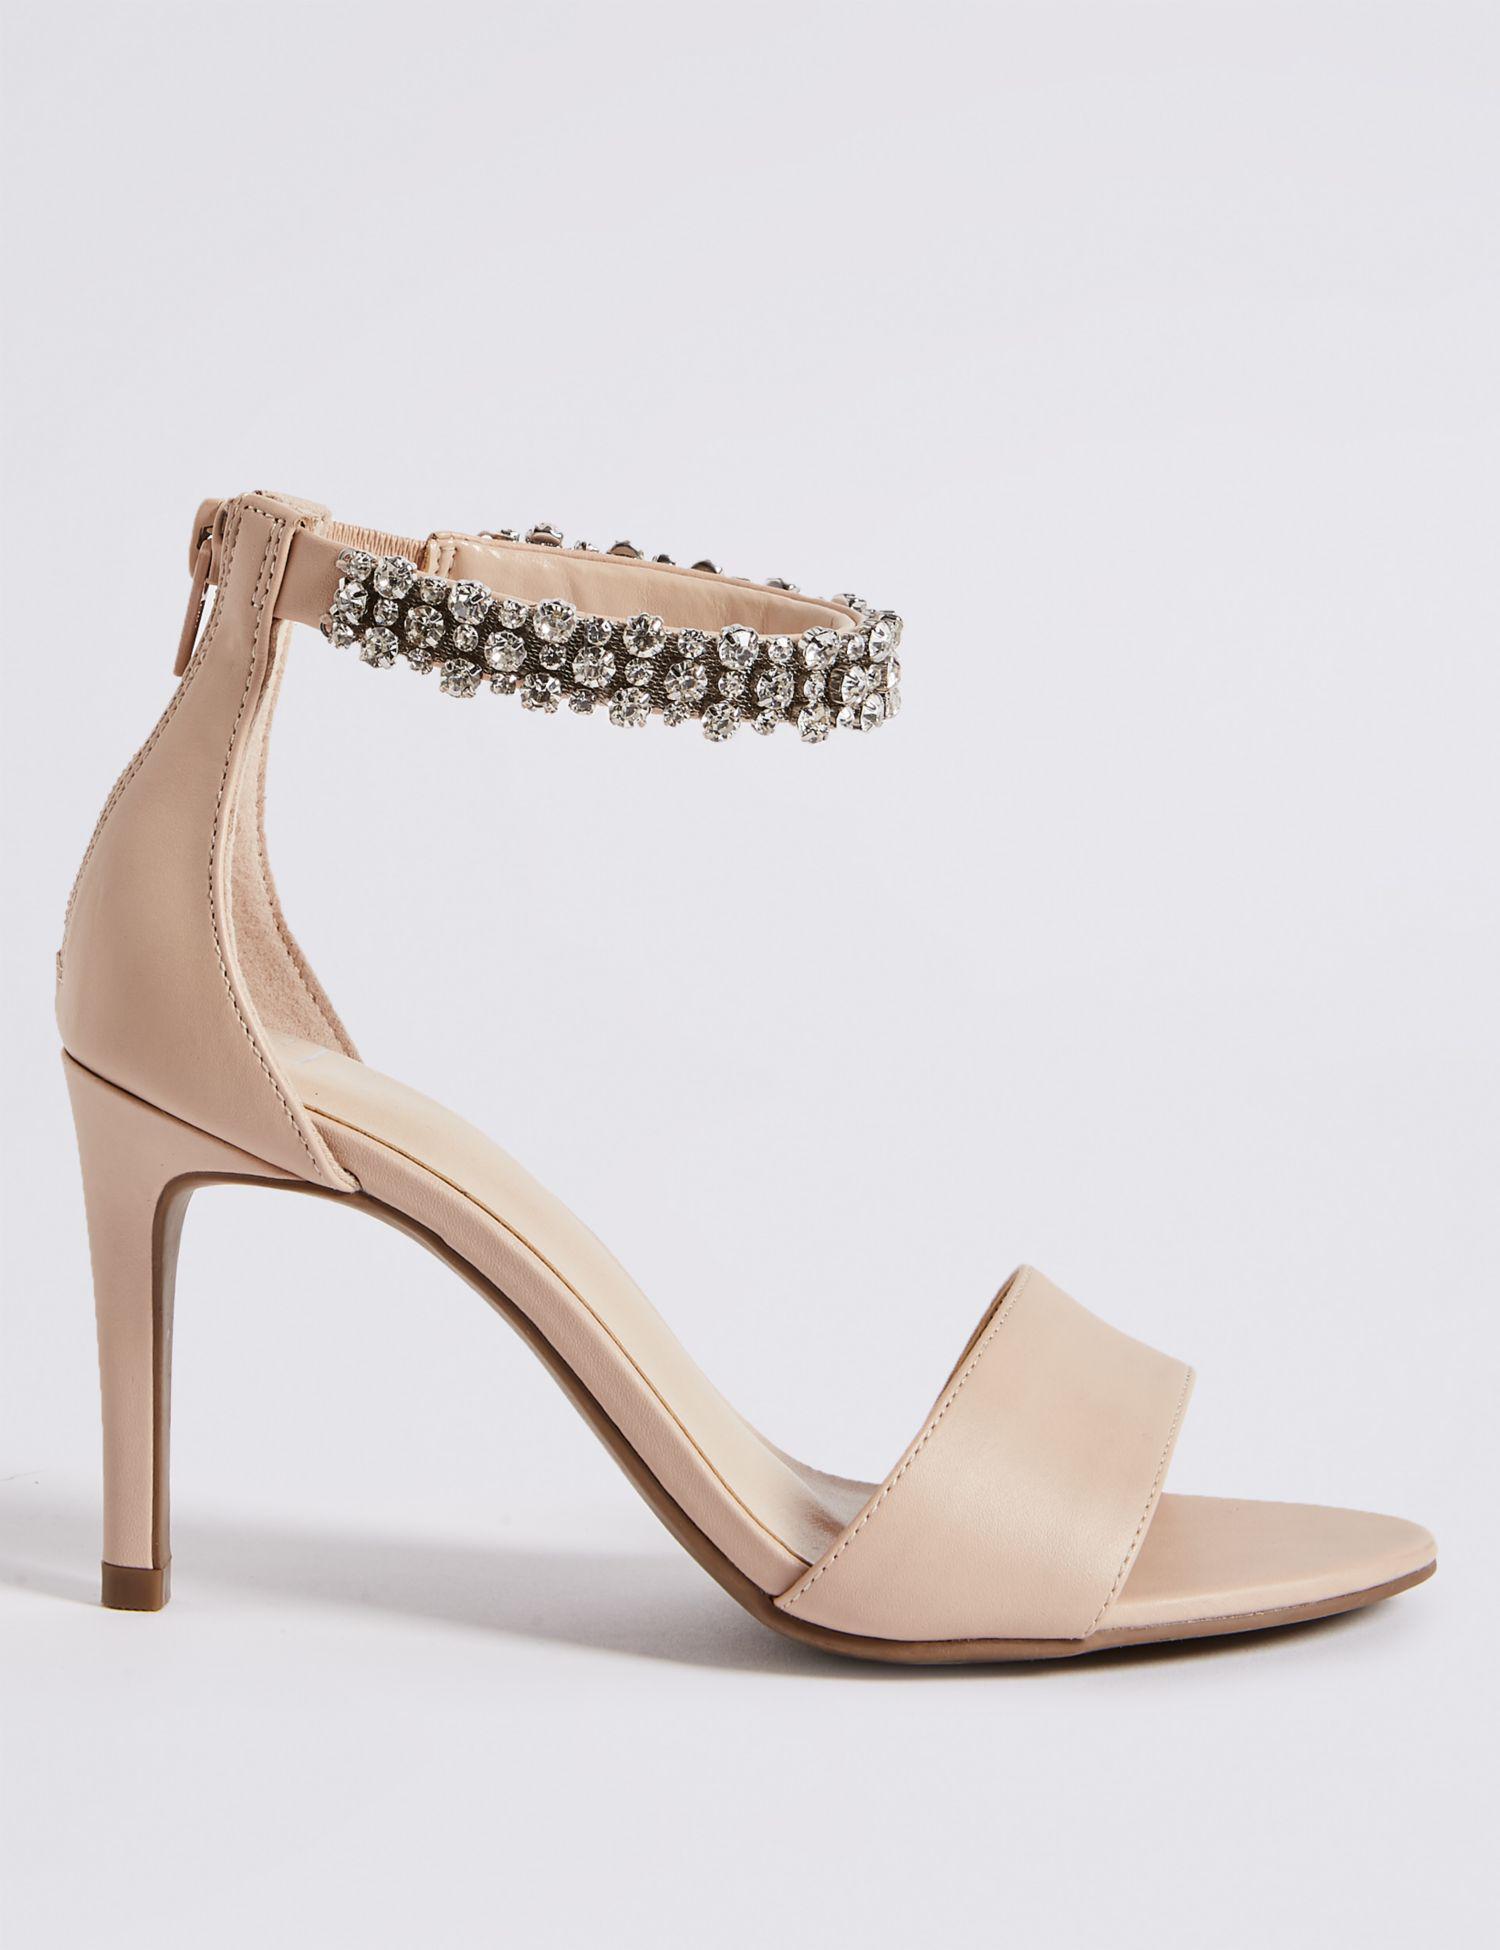 161f1bd8663 Marks   Spencer Stiletto Heel Jewel Ankle Strap Sandals in Natural ...